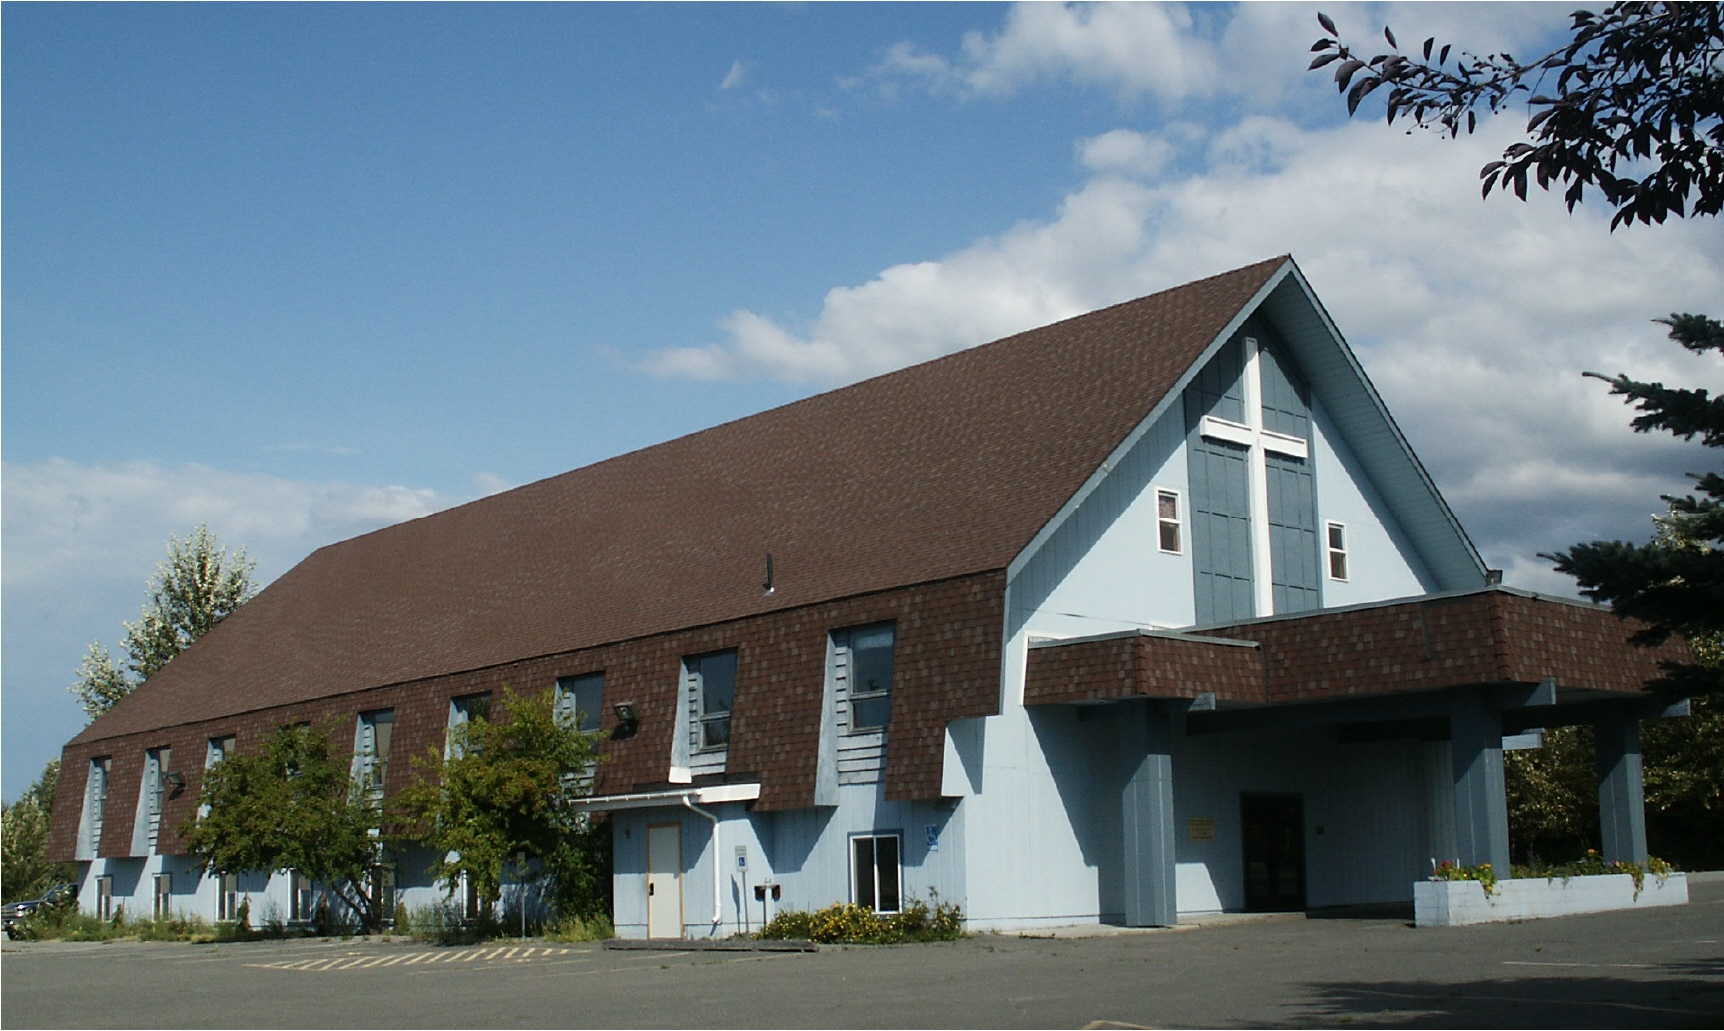 Baptist Church Cropped.jpg